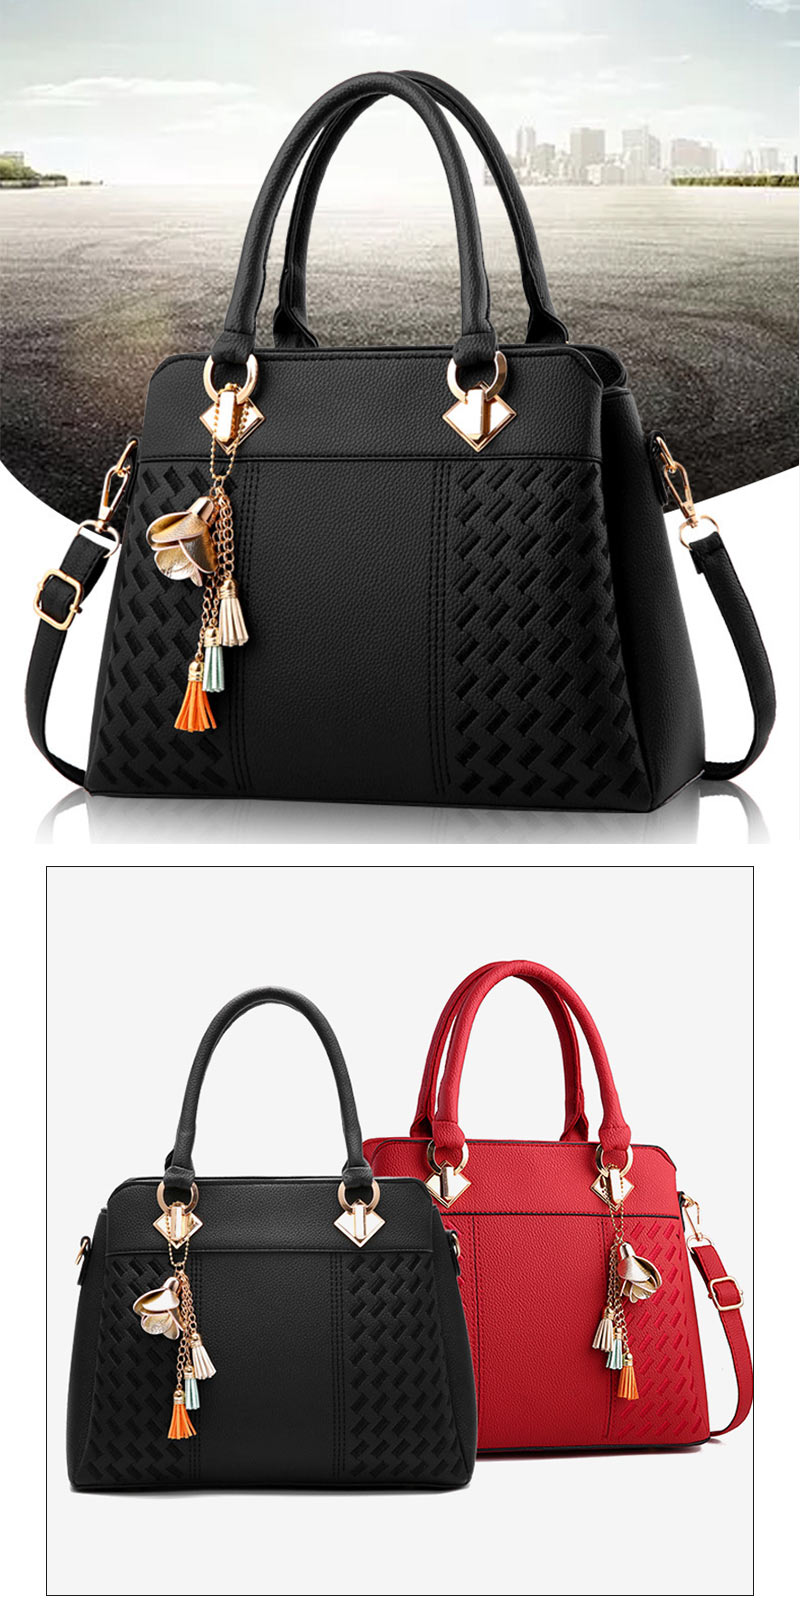 STSR Leather Clutch Bag Female Handbag Luxury Beach Tote Ms. Fringe Shoulder Bag Tote gray one size 10